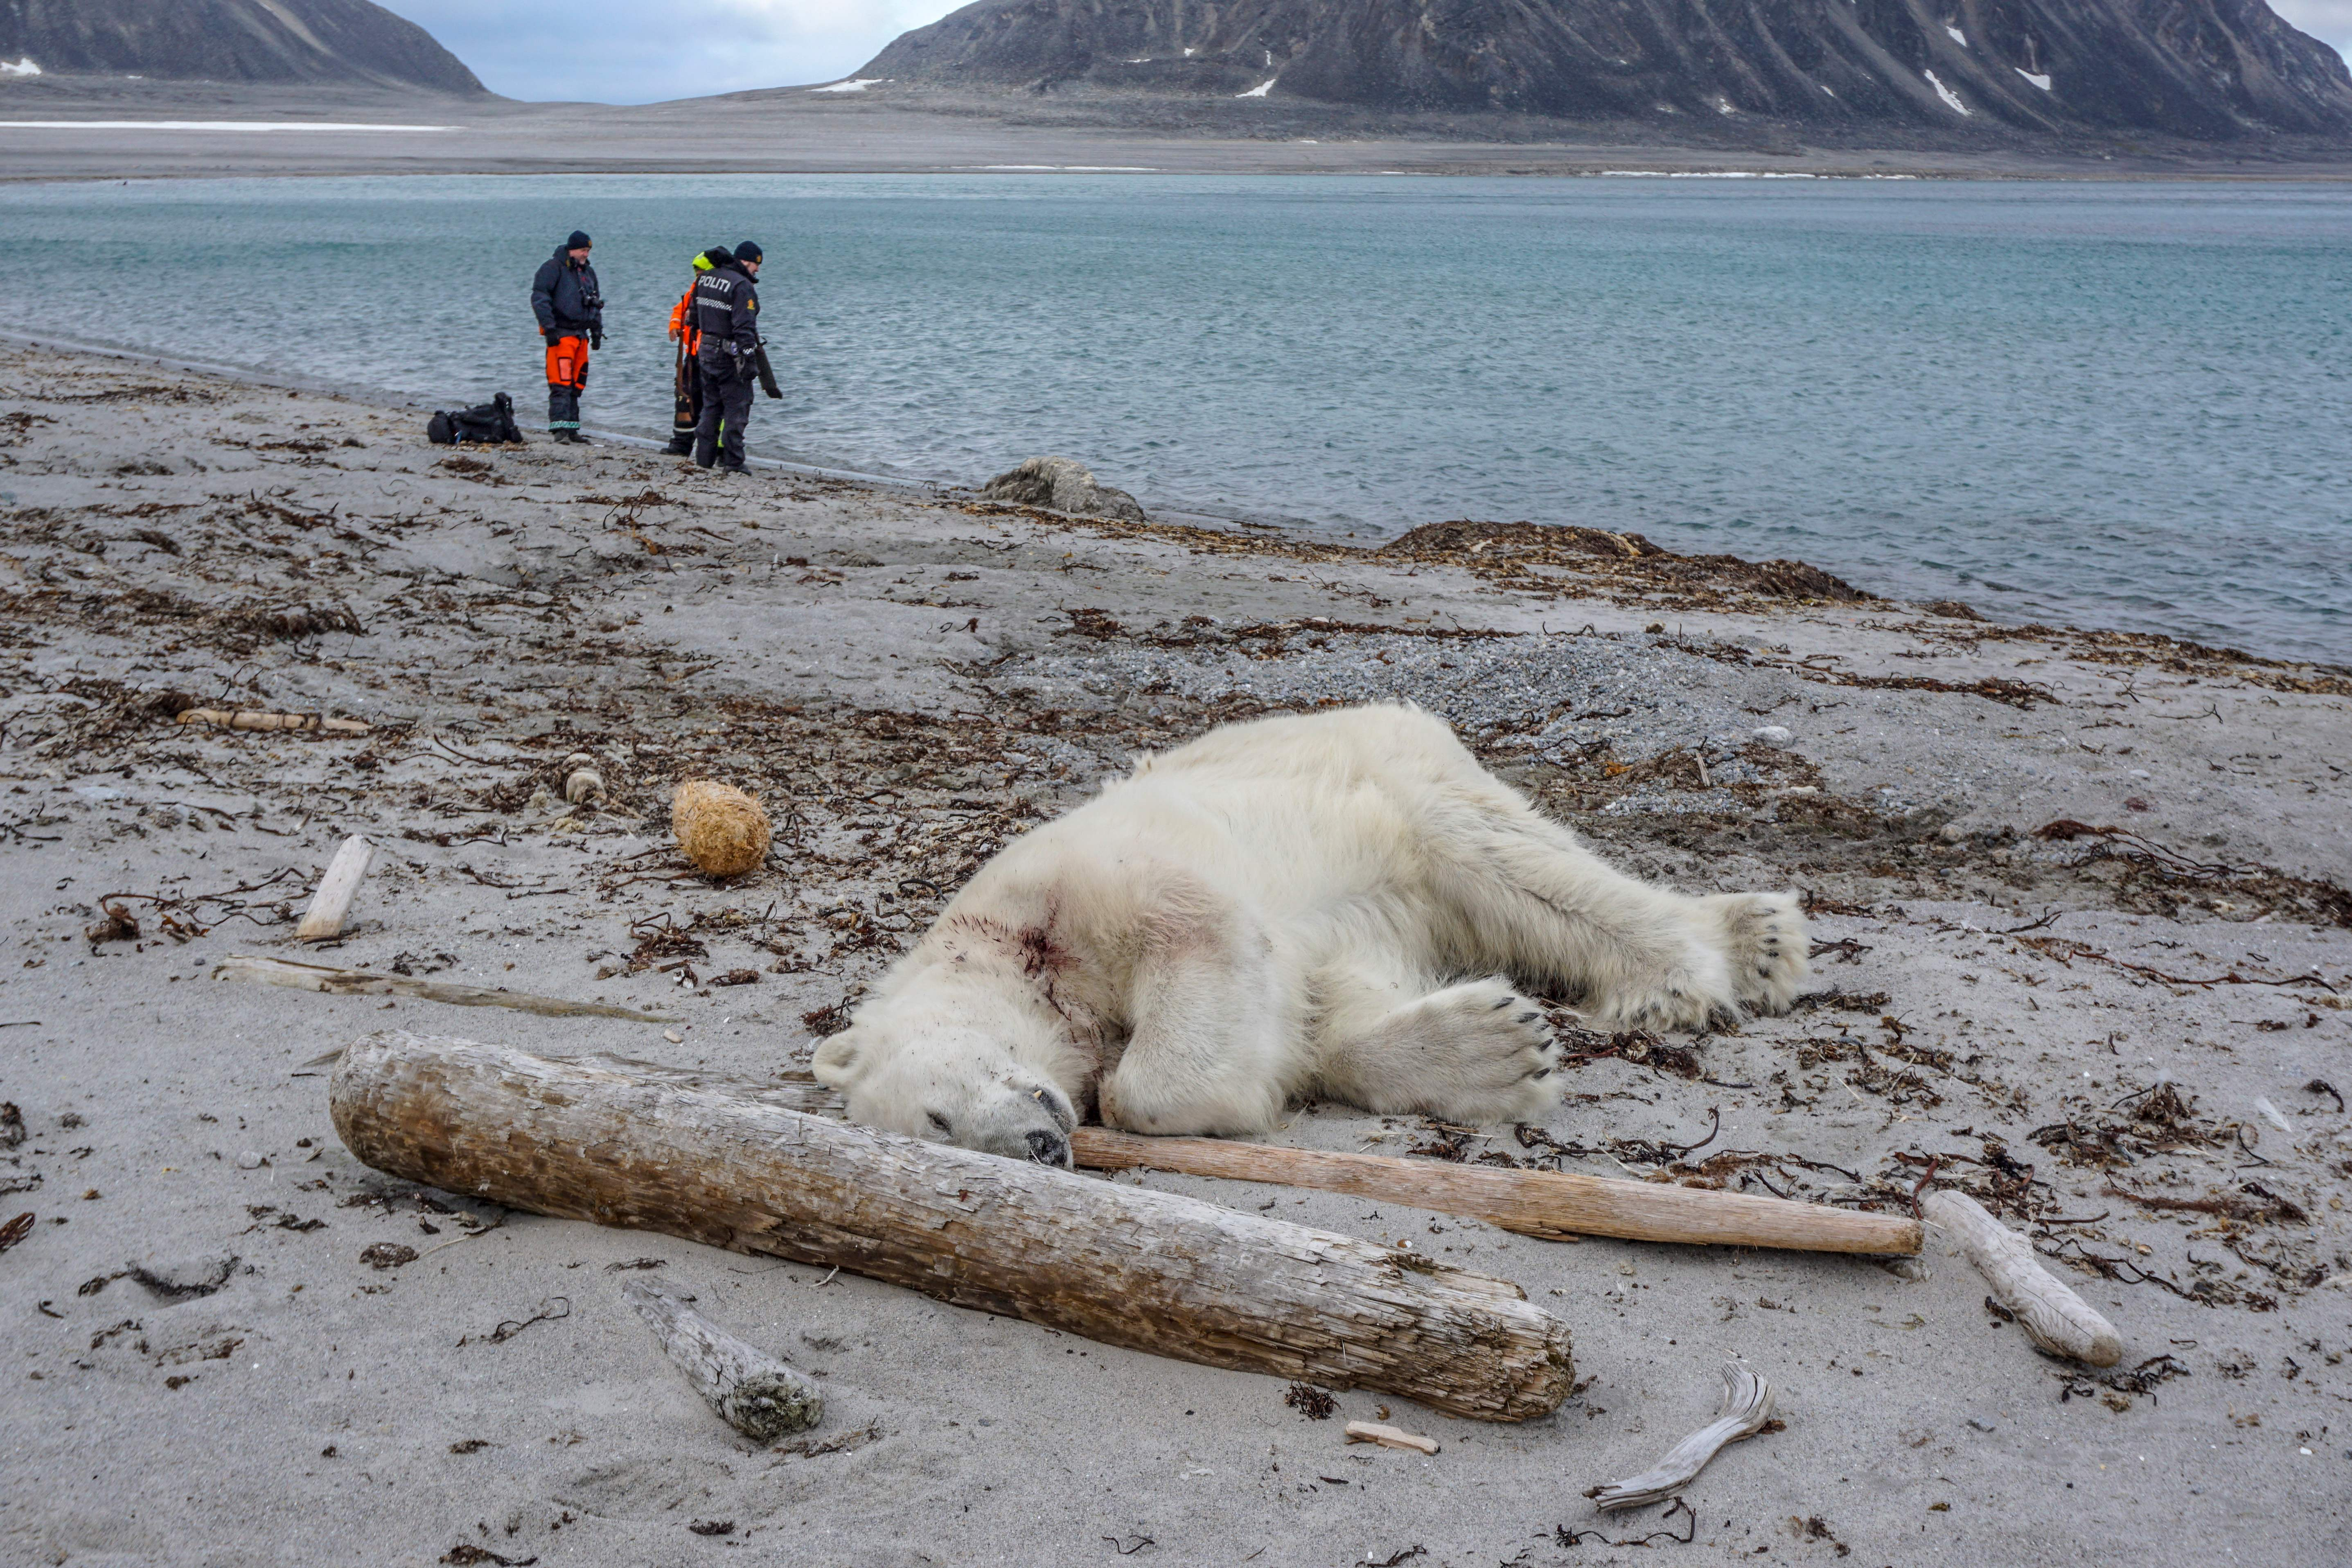 TOPSHOT-NORWAY-ARCTIC-ANIMALS-POLAR-BEAR